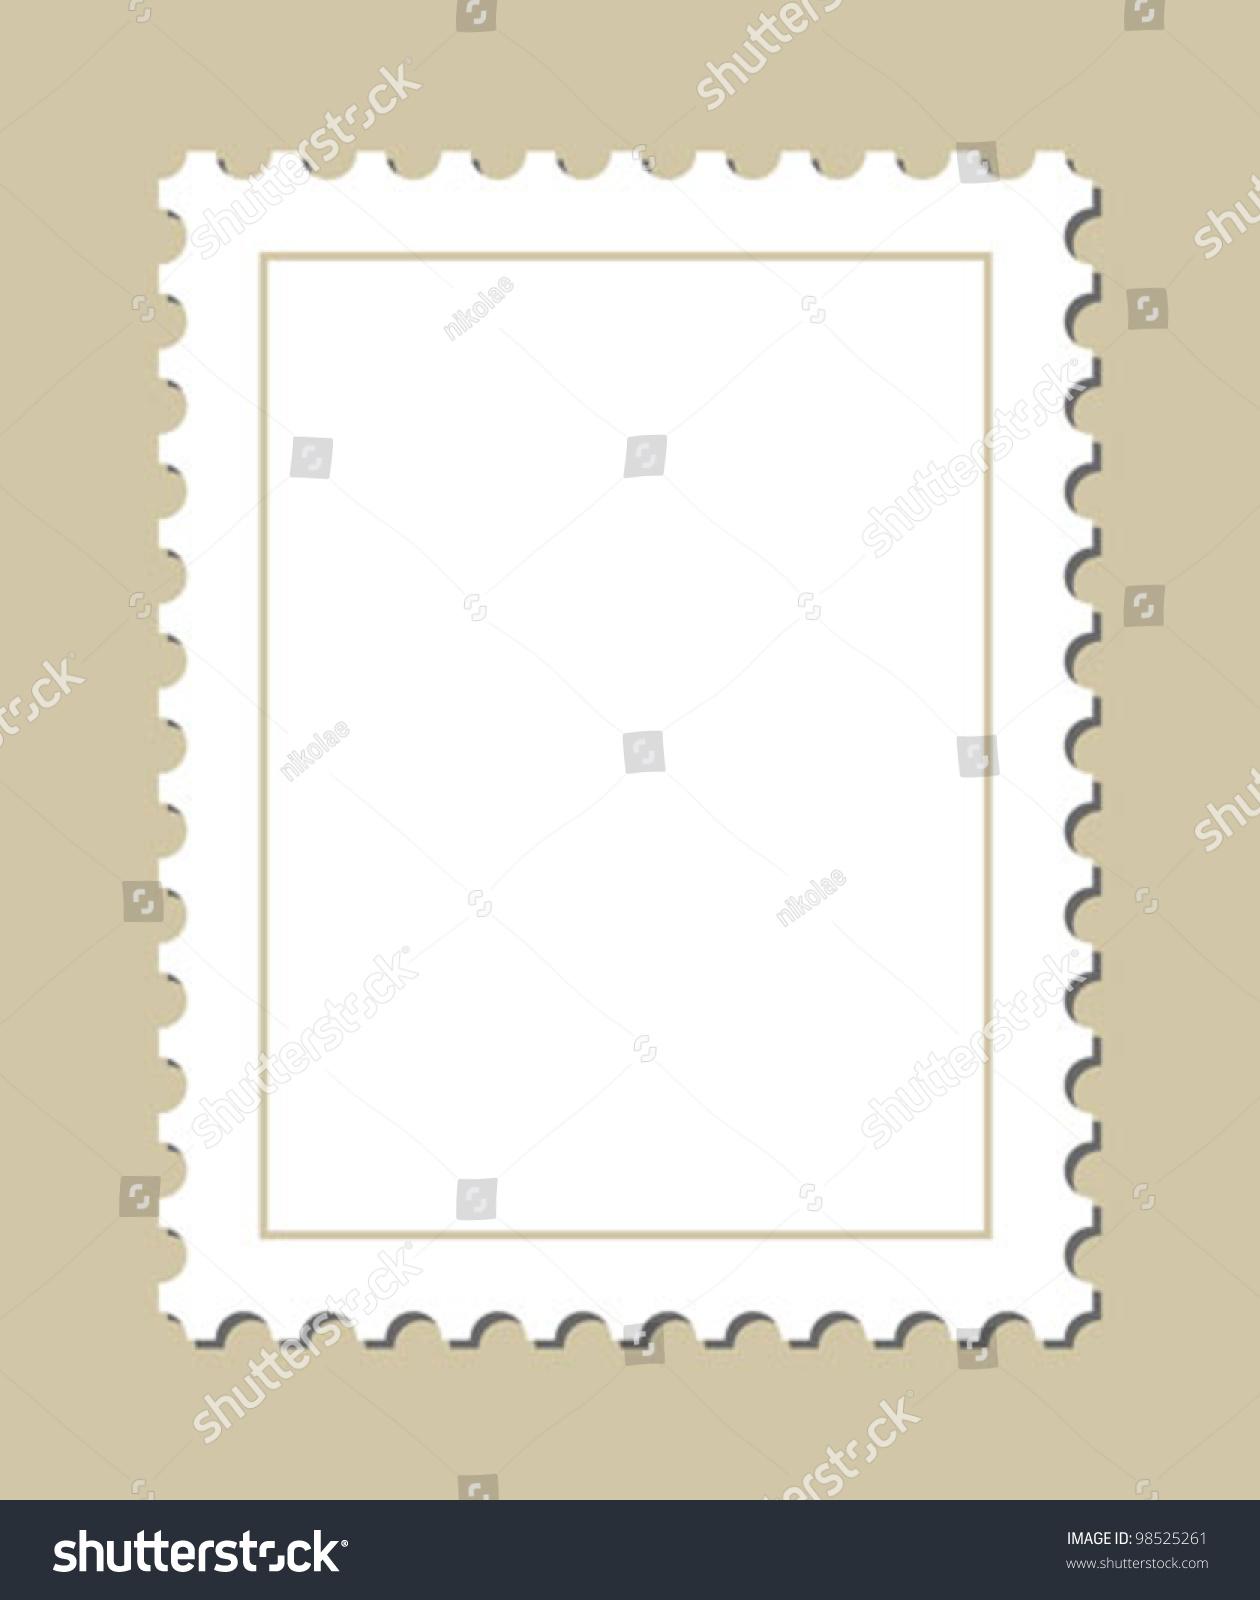 Blank Stamp Template Stock Vector 98525261 - Shutterstock